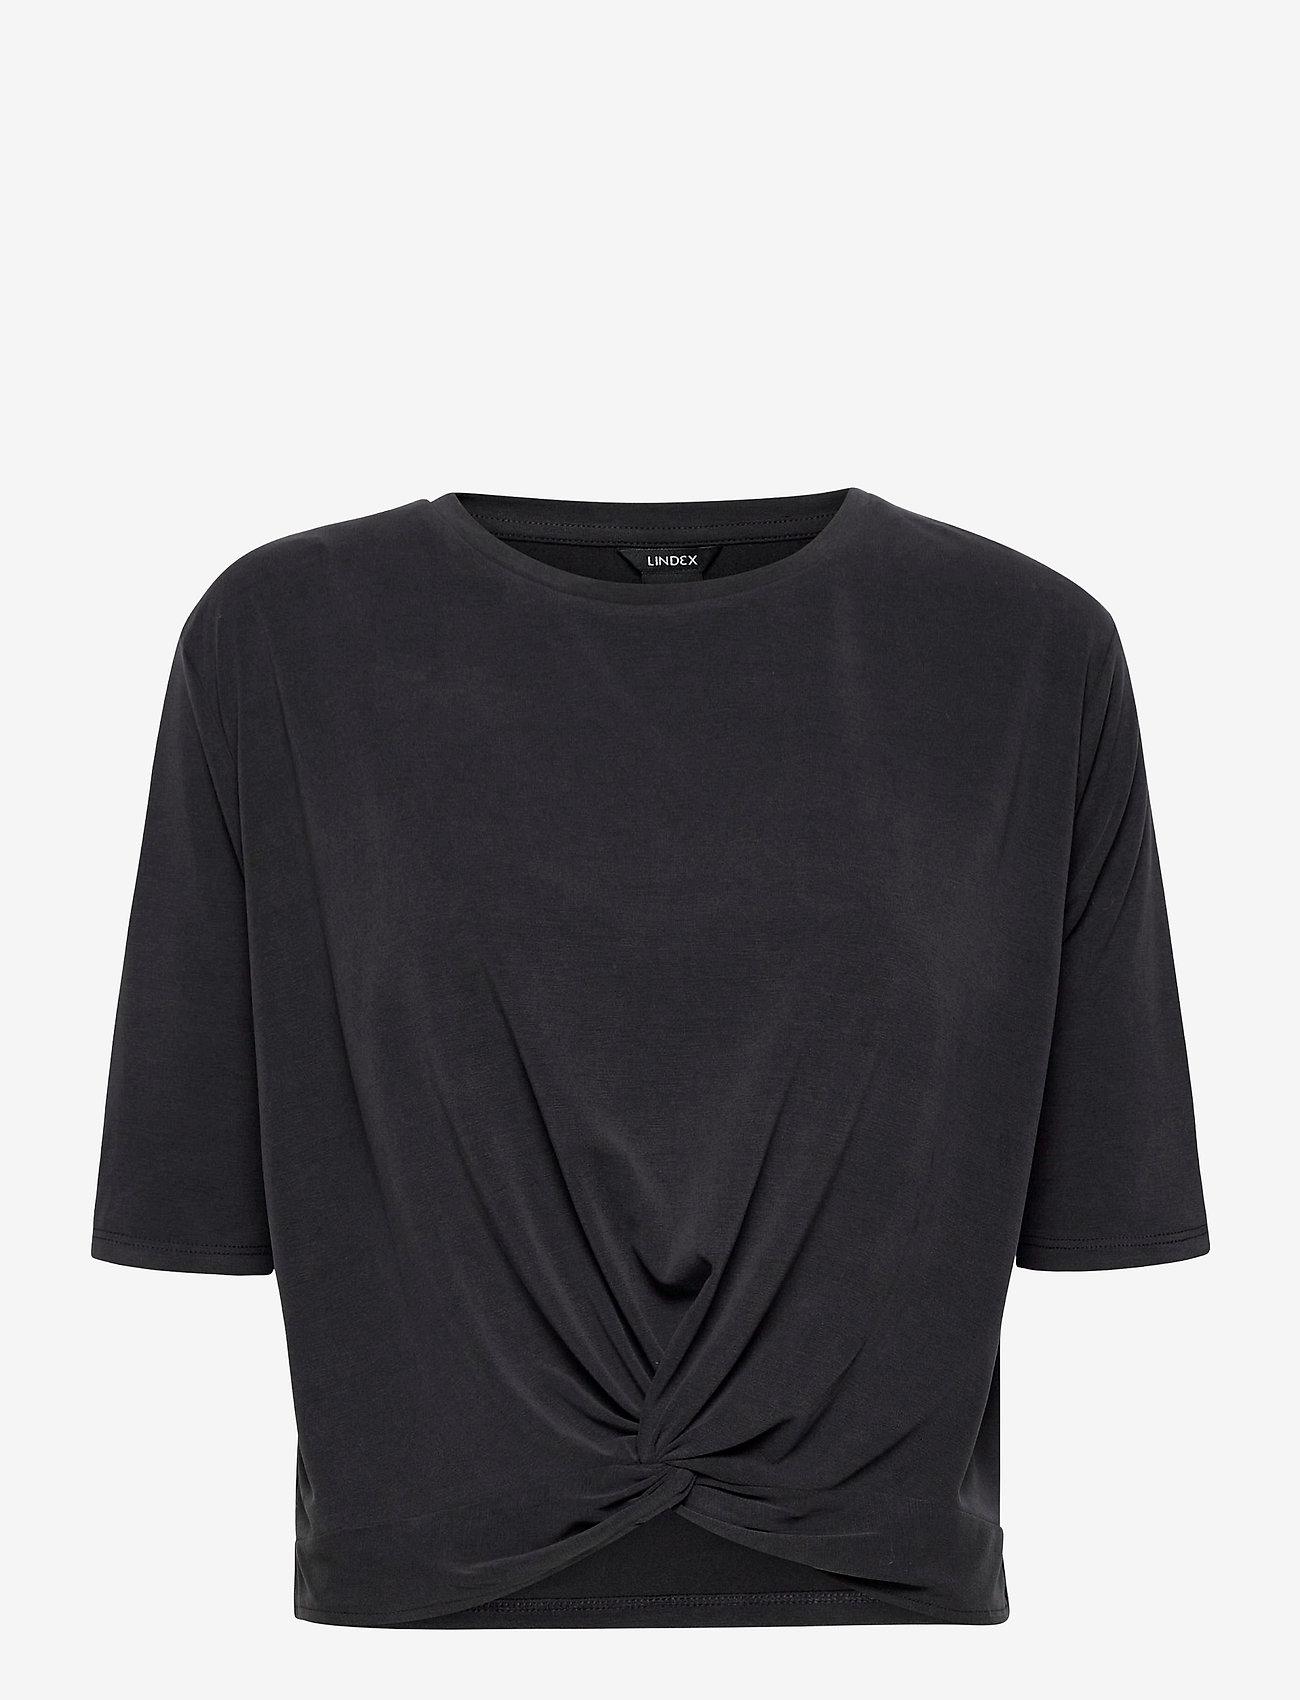 Lindex - top Otilia - t-shirts - black - 0